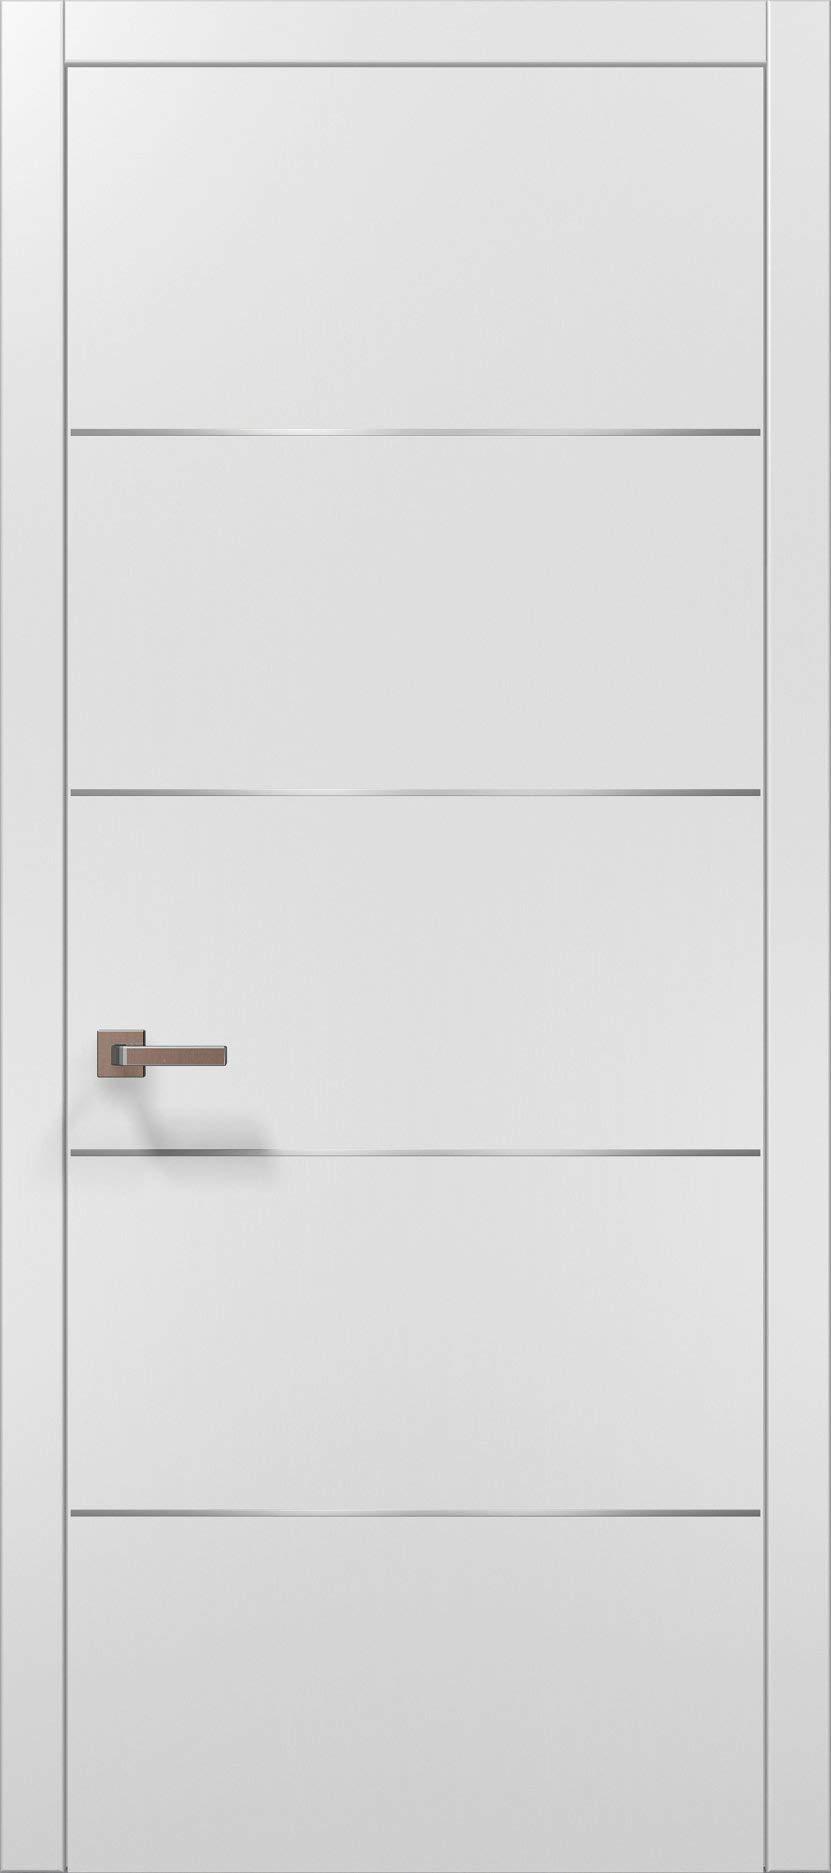 Pre-Hung White Modern Door 32x80 with Strips | Planum 0020 Matte White | Frame Trims Lever Satin Nickel Hardware | Closet Solid Core Door